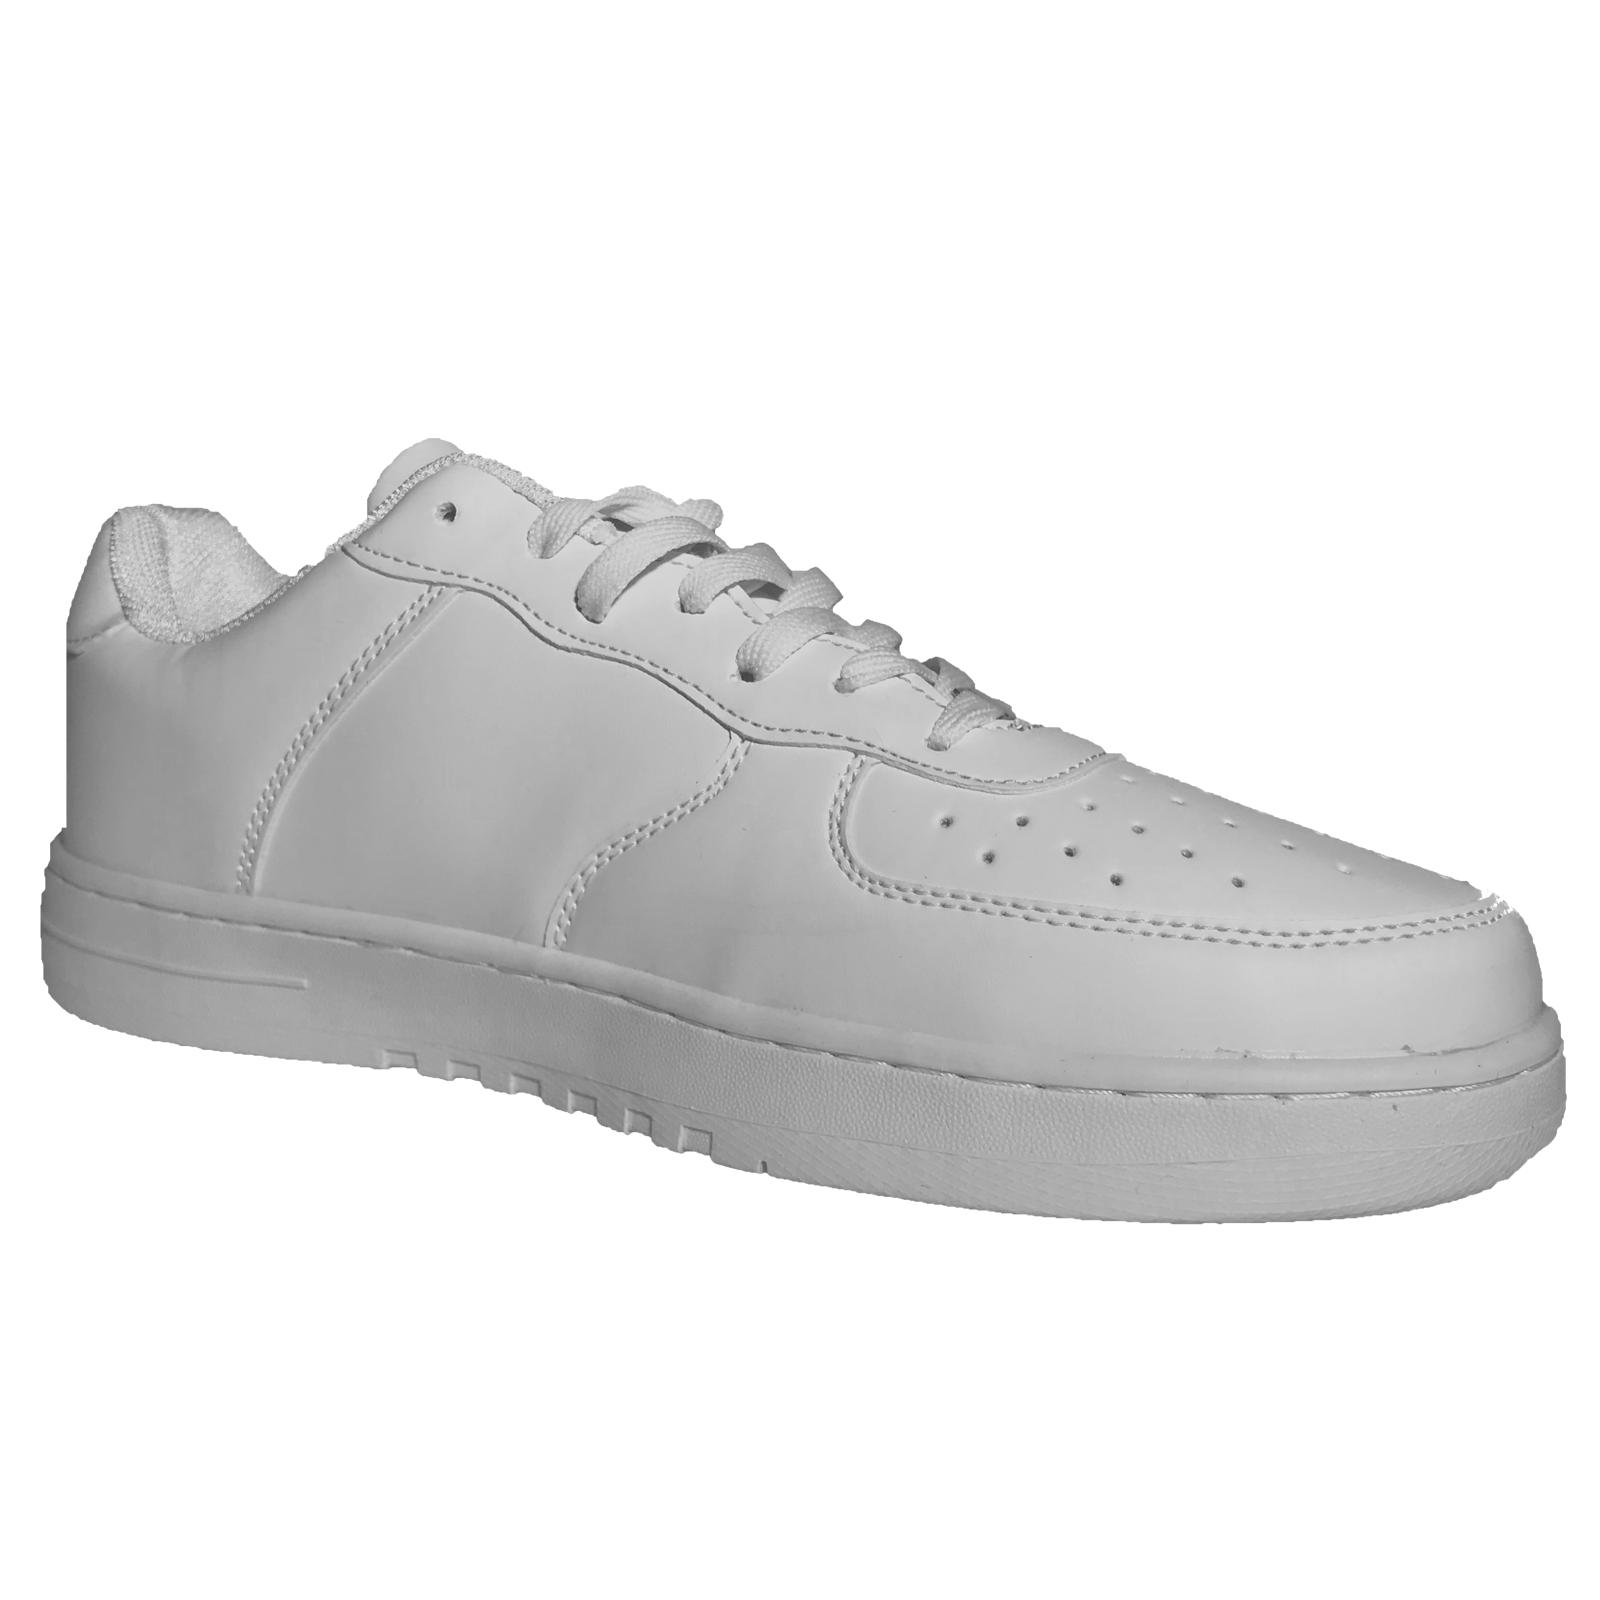 Scarpe-Ginnastica-Uomo-Pelle-PU-Nero-Running-Passeggio-Tipo-Nike miniatura 9